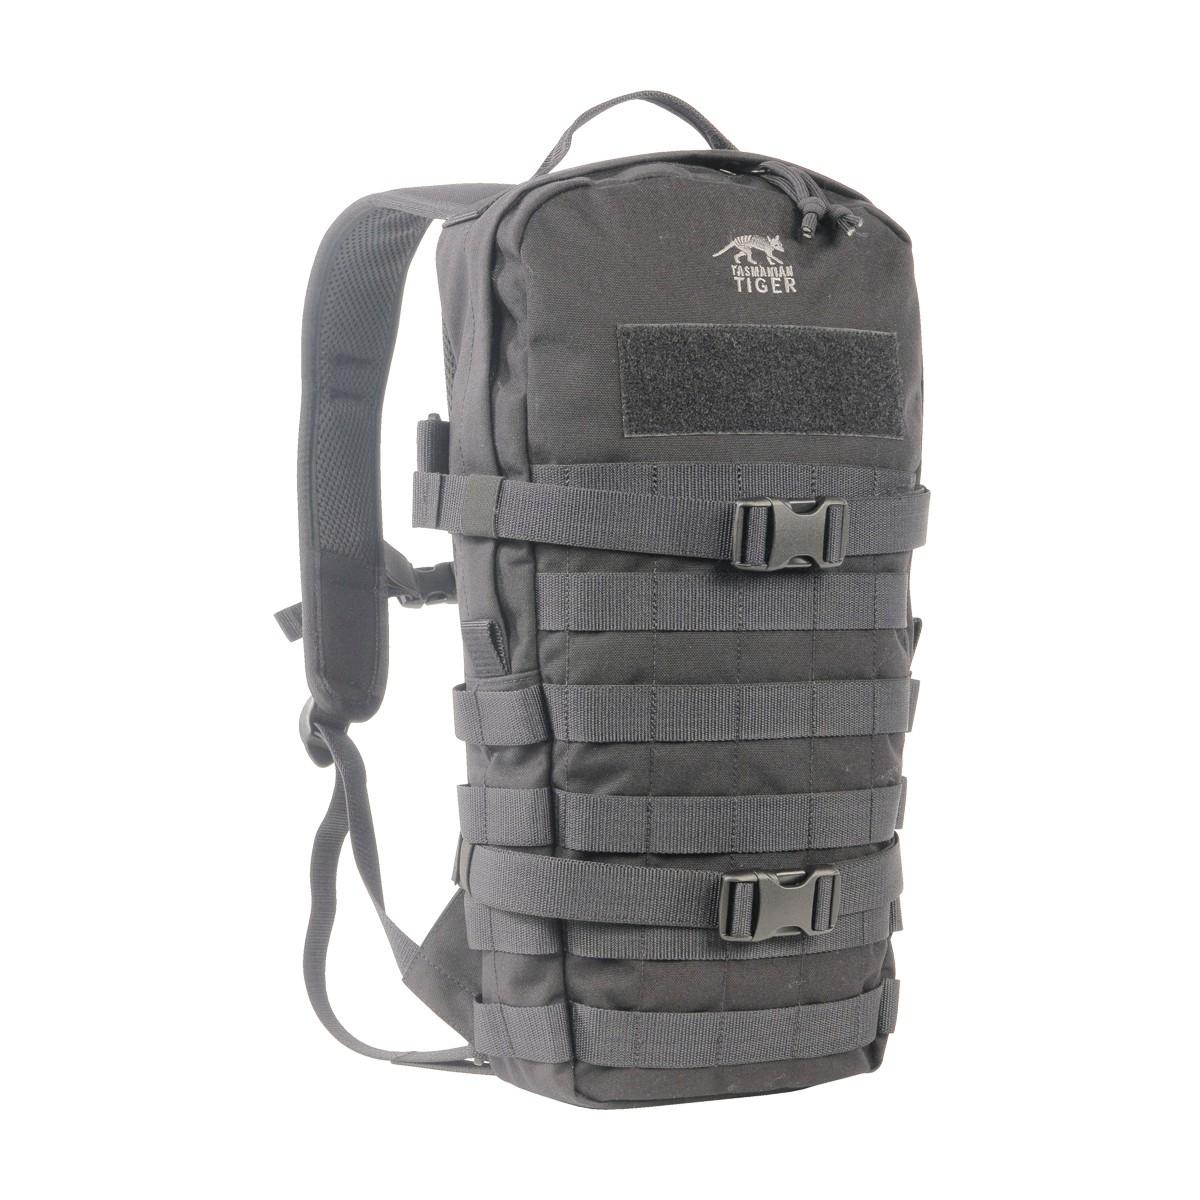 Tt essential pack как велорюкзак рюкзак vanguard up-rise 48